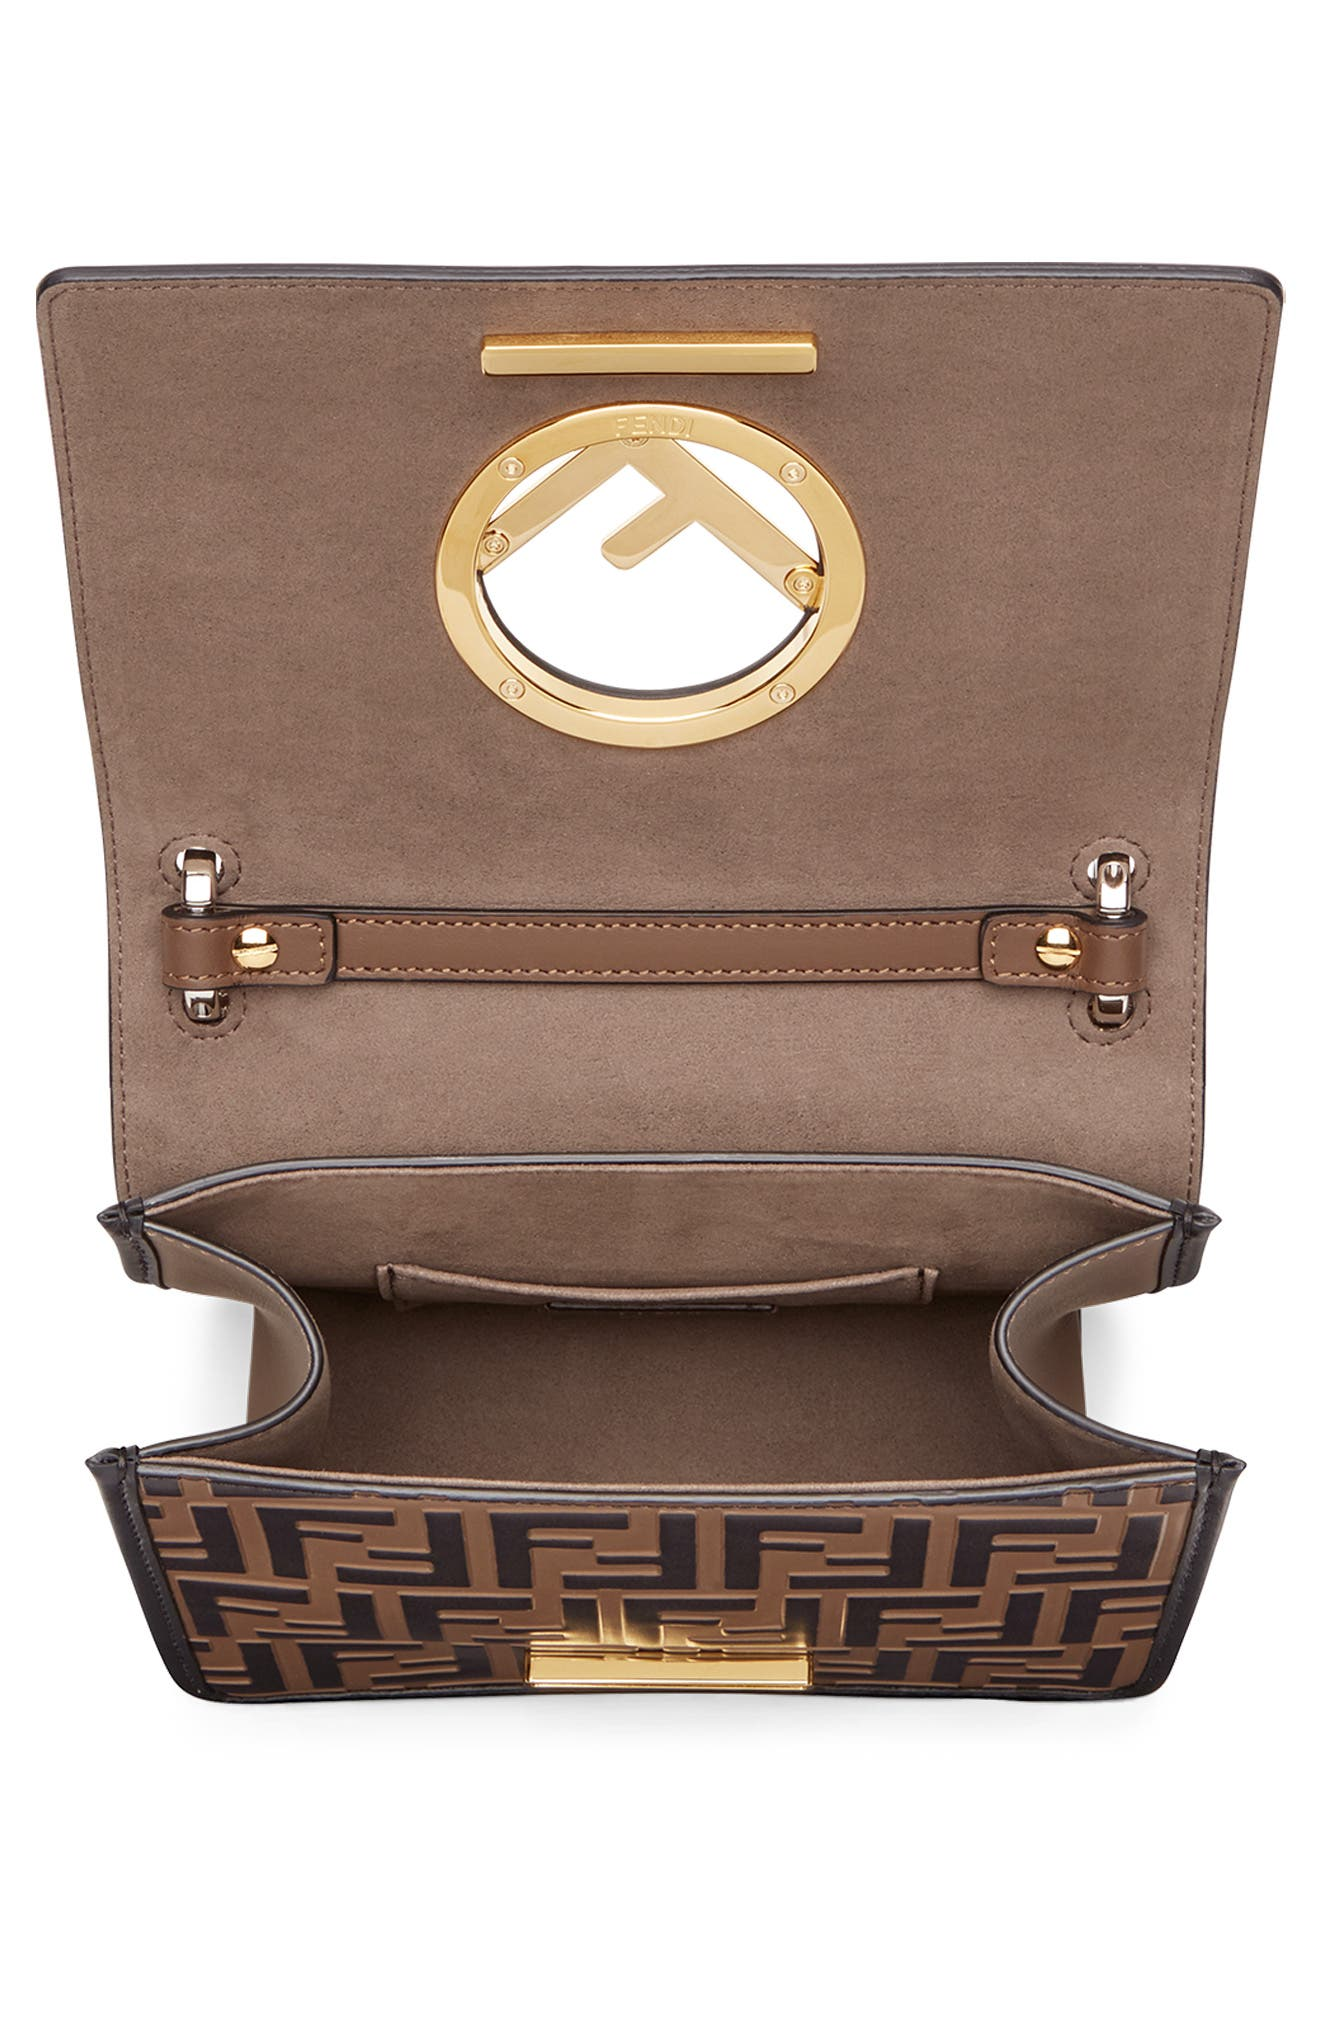 FENDI,                             Small Kan I Logo Embossed Leather Shoulder Bag,                             Alternate thumbnail 3, color,                             MAYA/ NERO